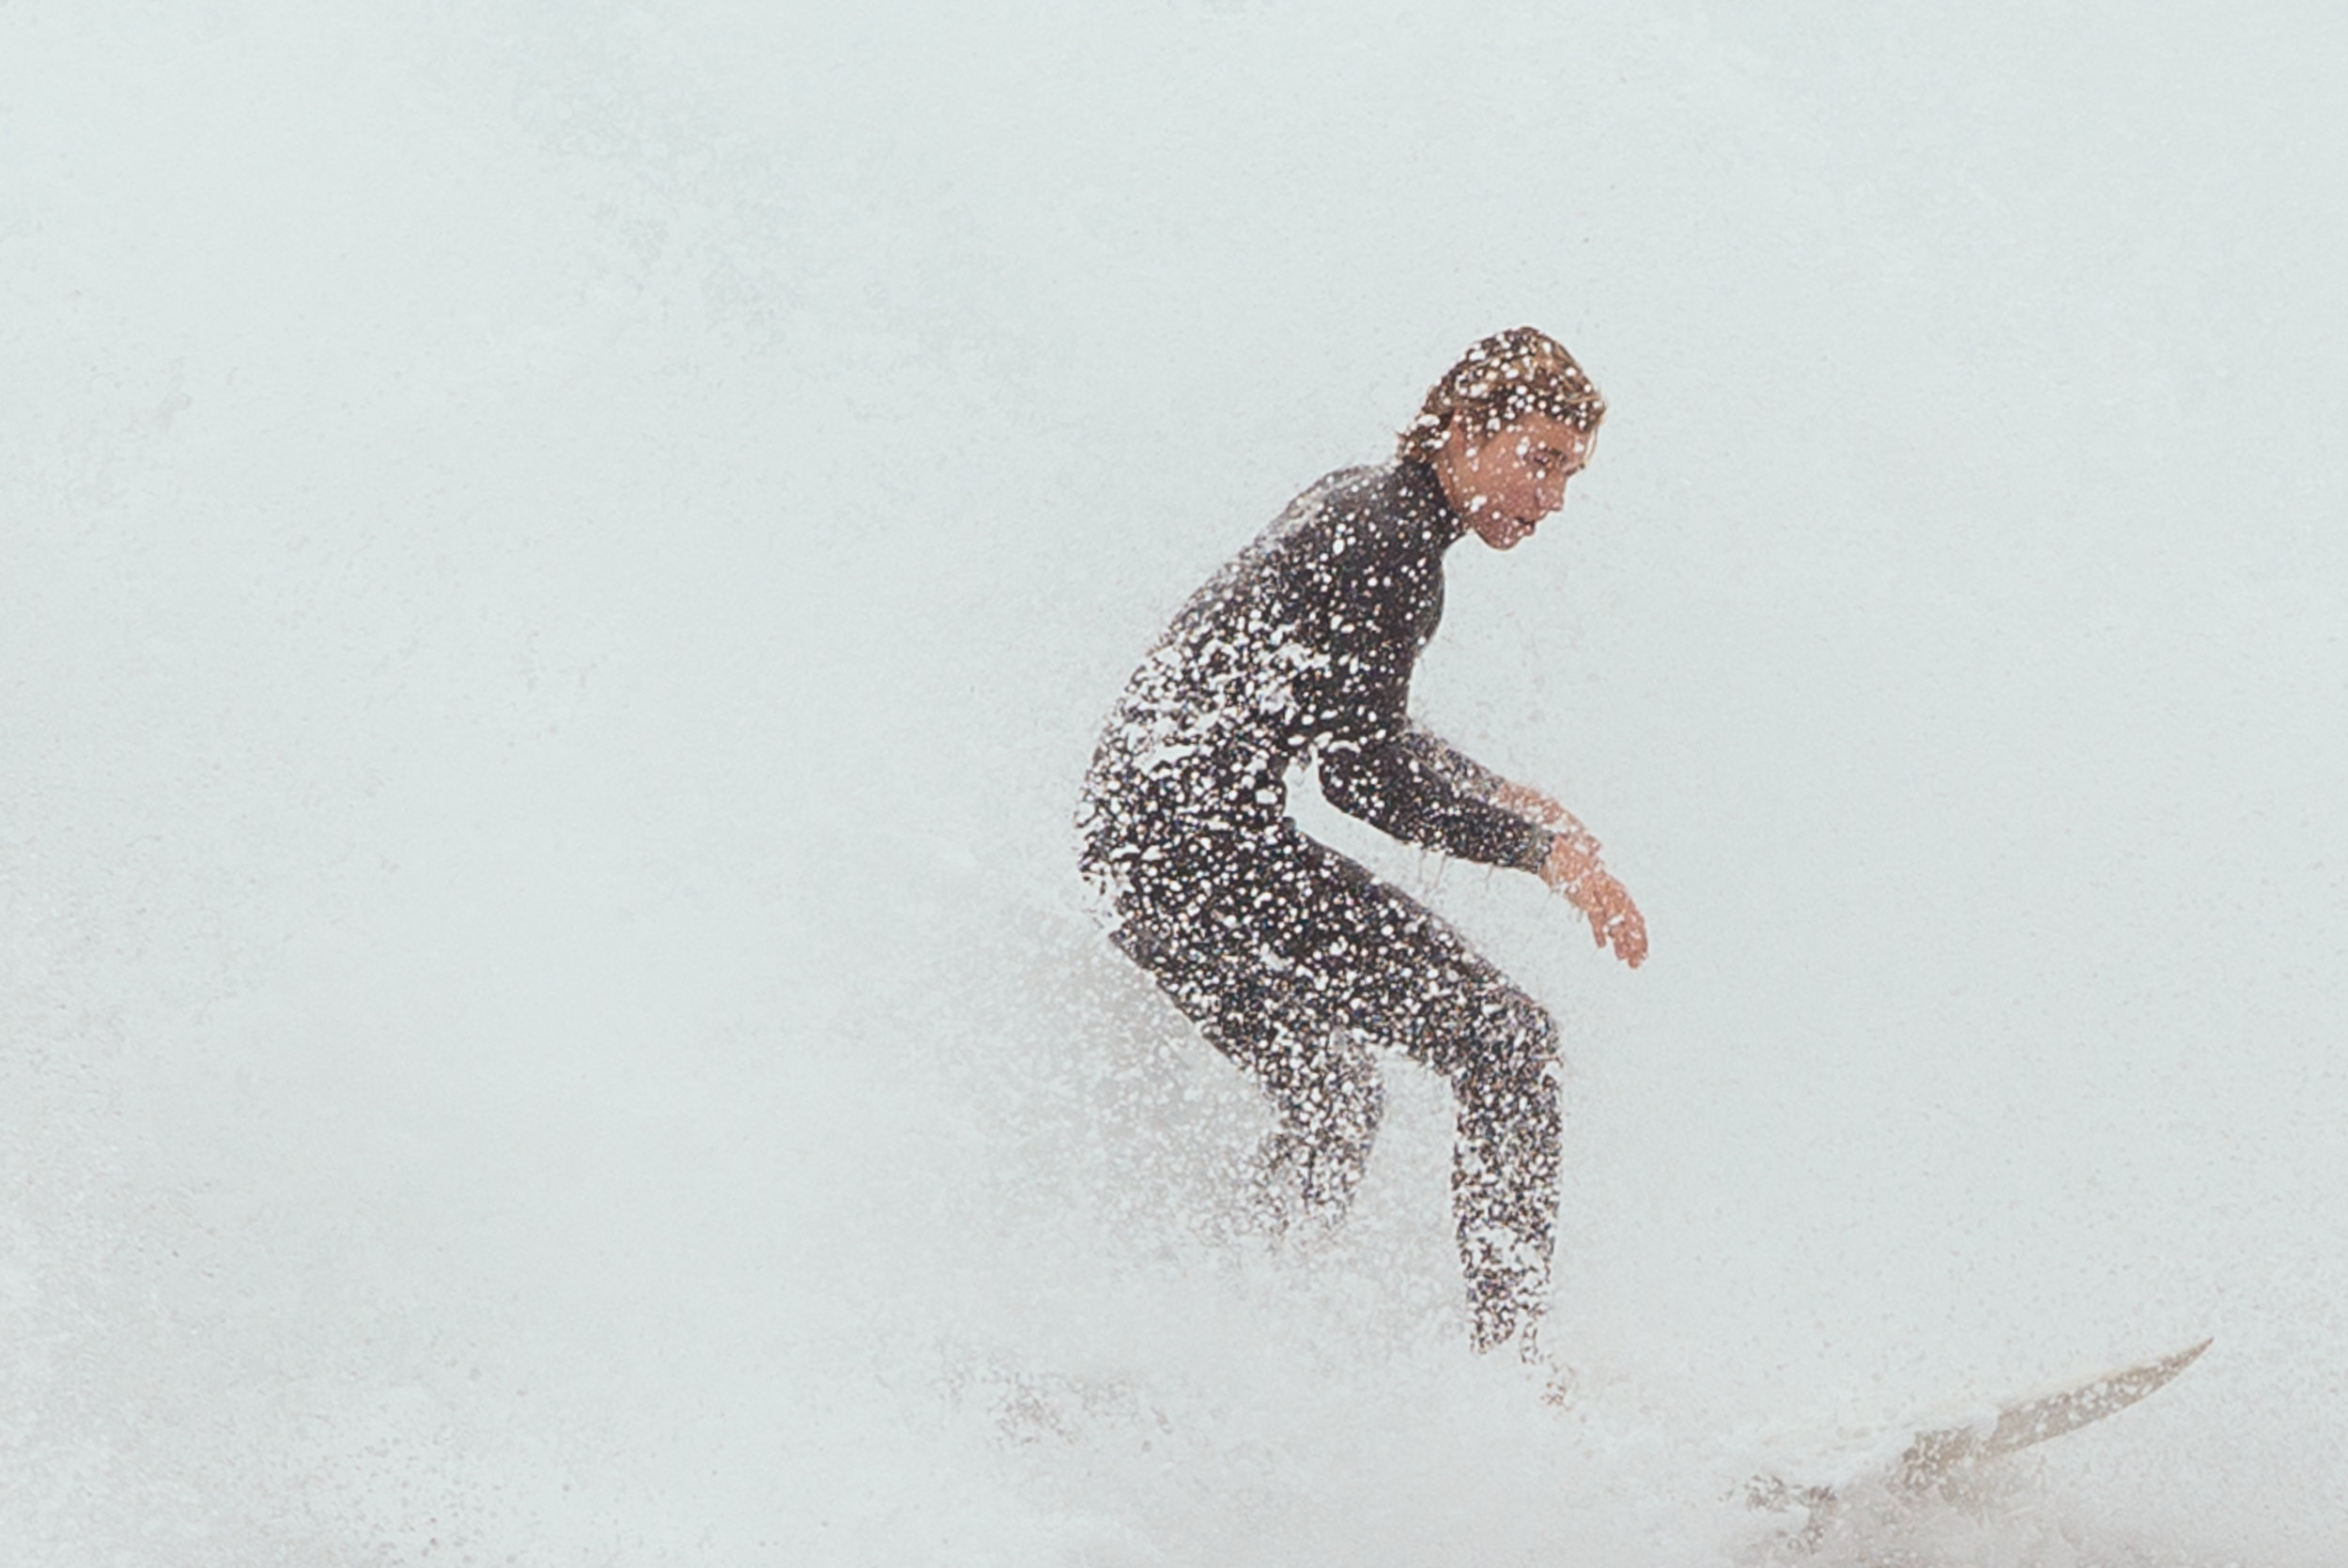 surf_july31-5.JPG